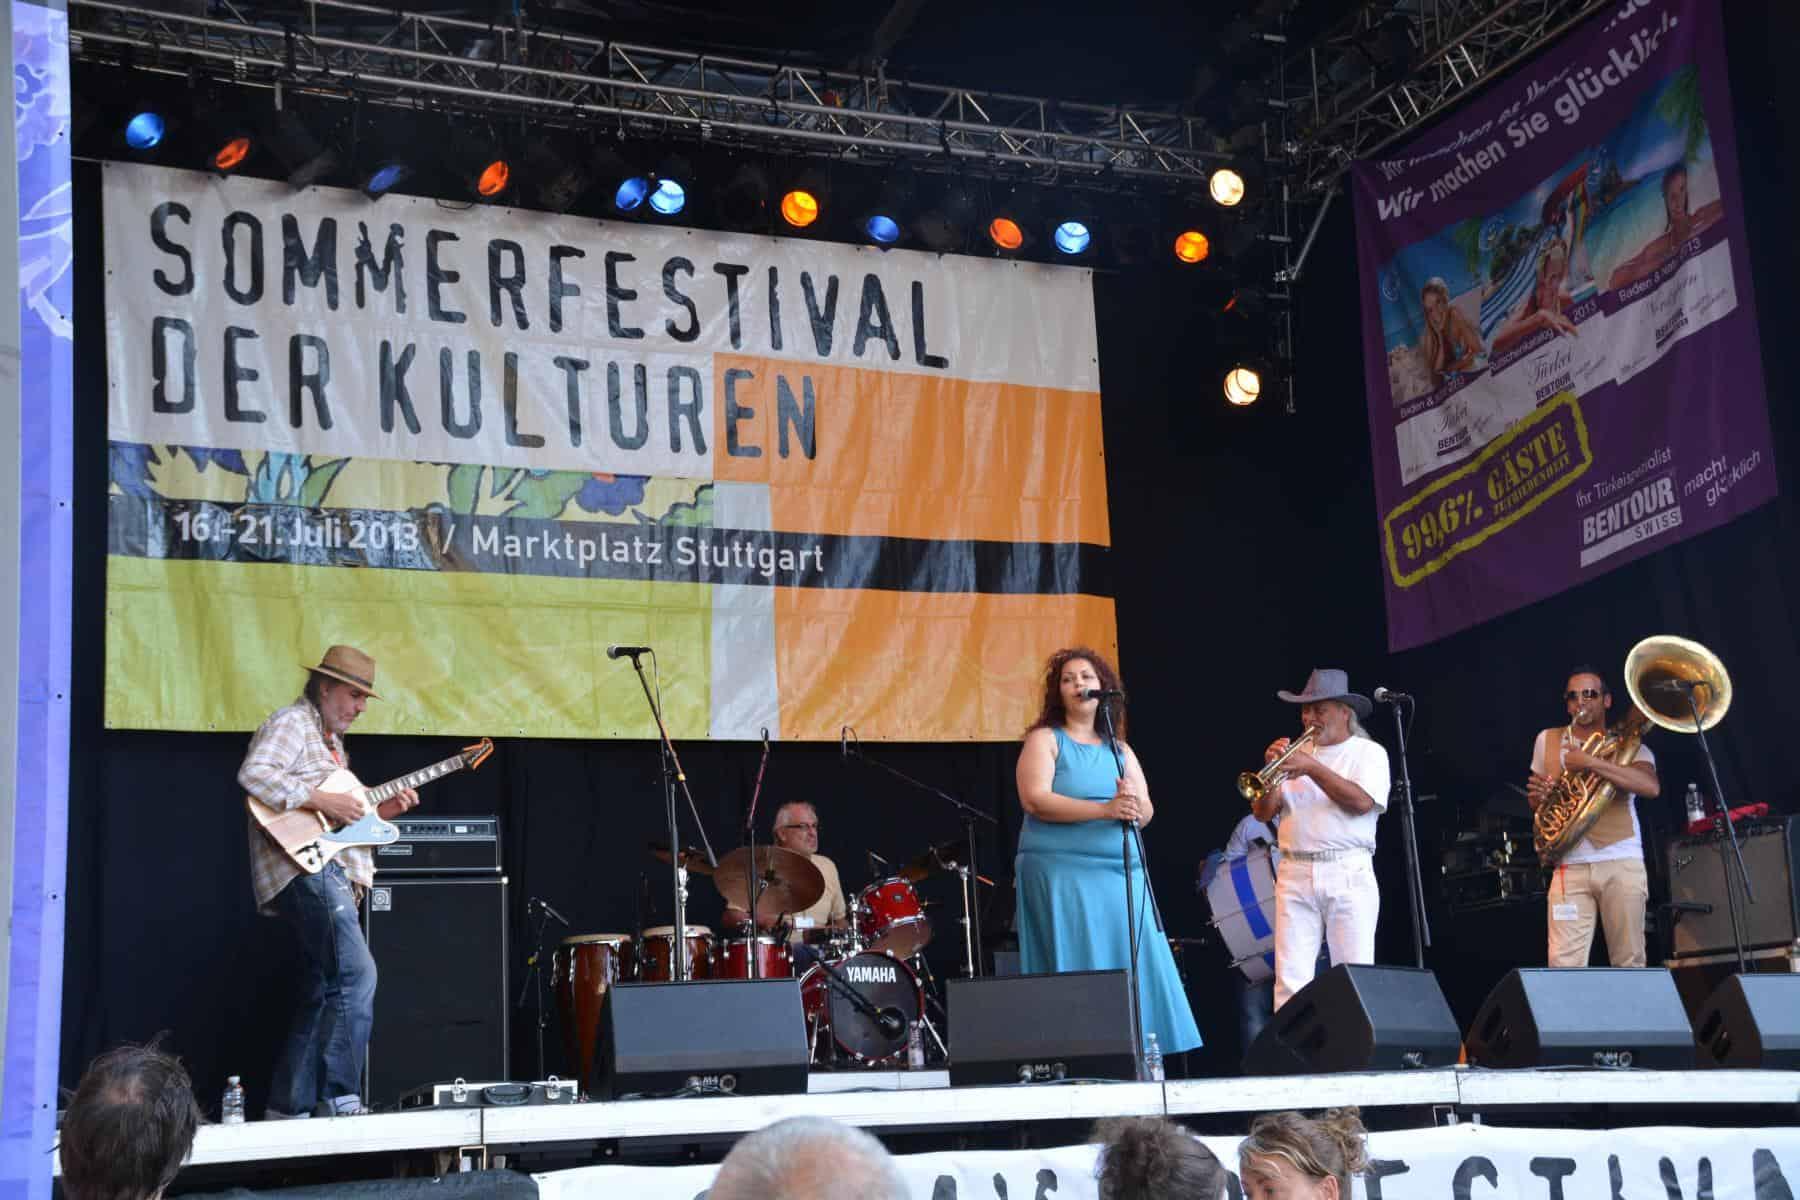 Sommerfestival der Kulturen Stuttgart 2013 – Tag 4: Ärger über mich selbst